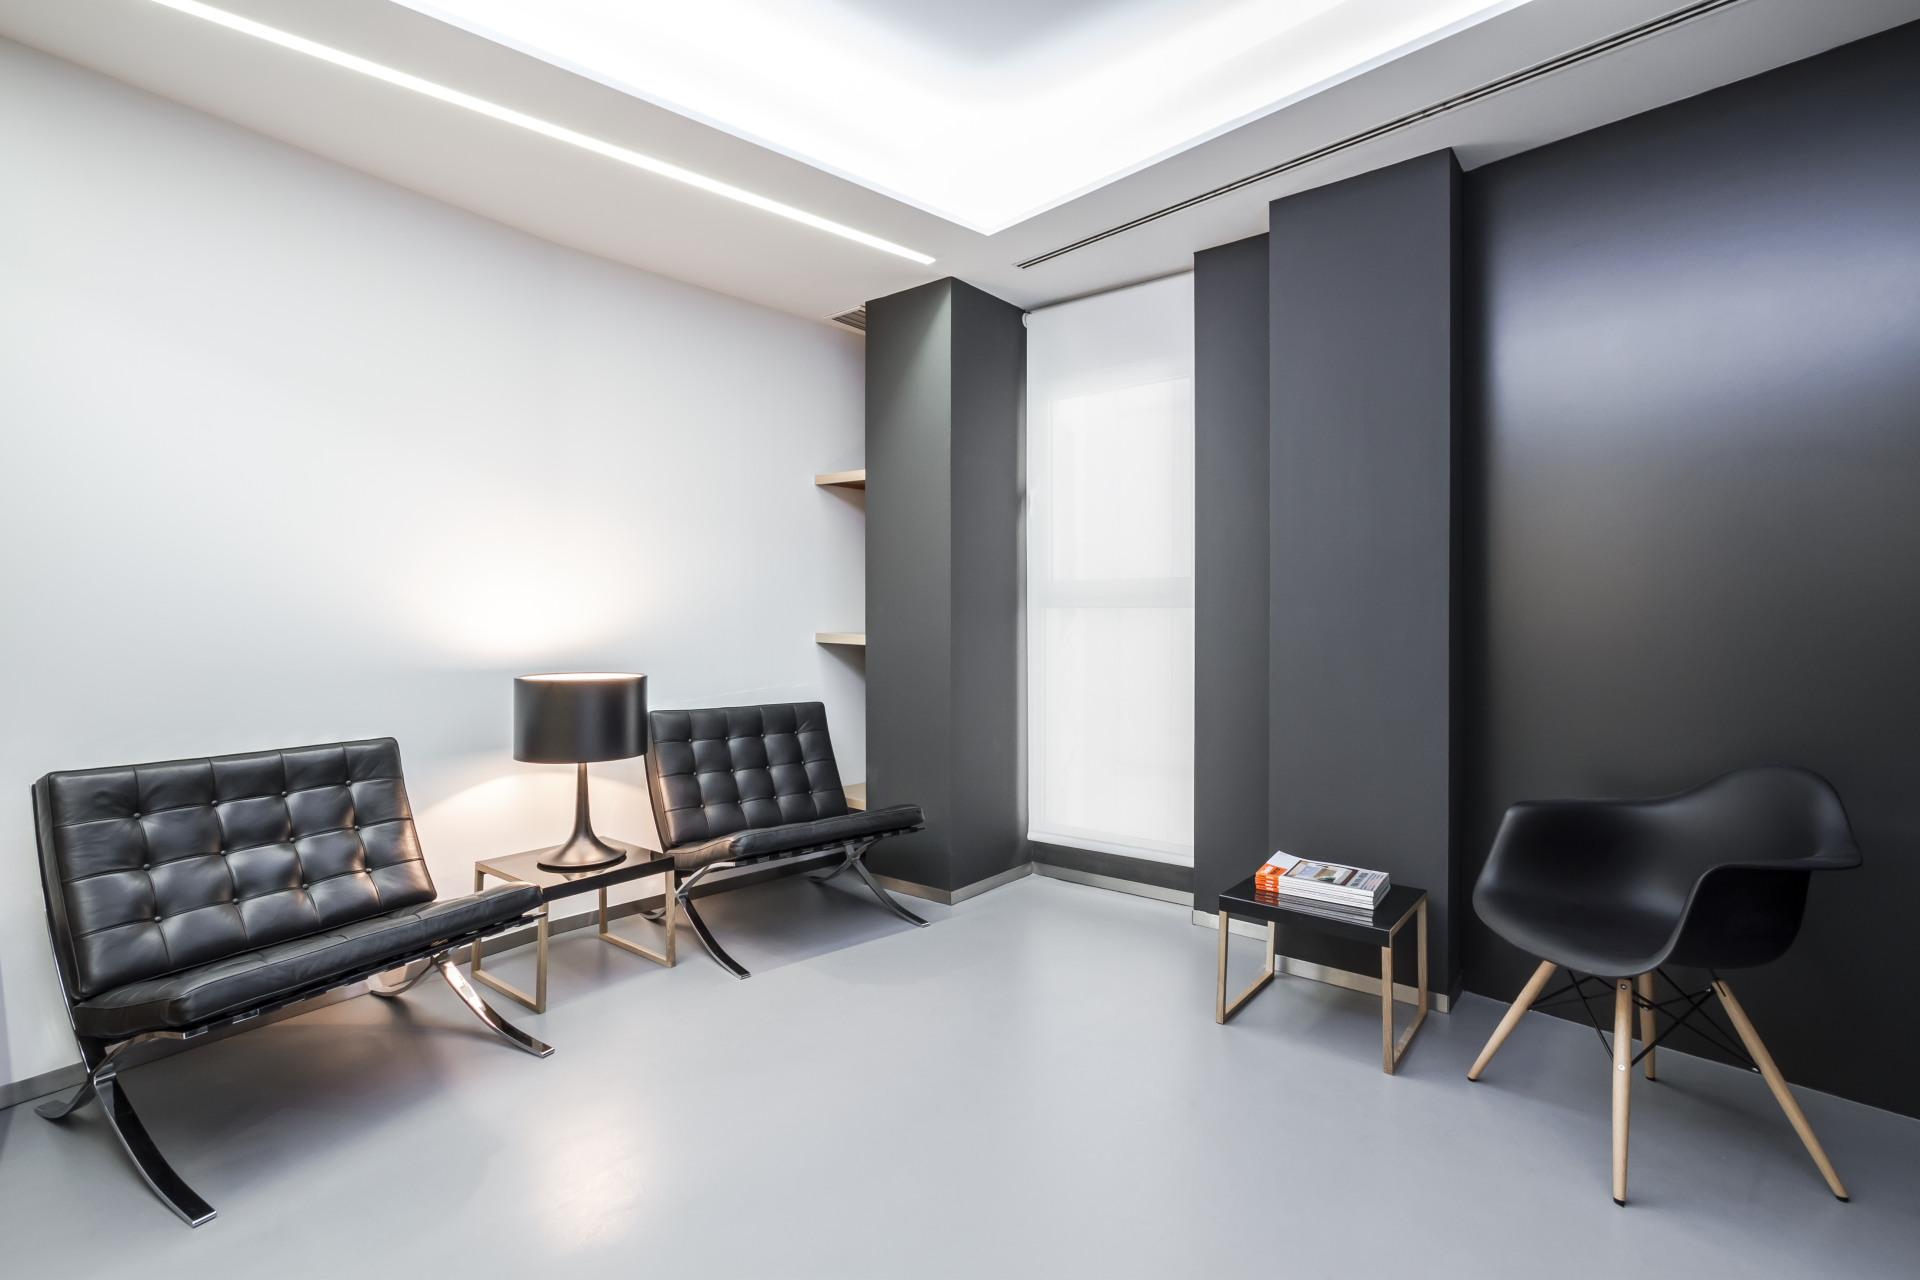 fotografia-arquitectura-valencia-german-cabo-hernandez-clinica (5)